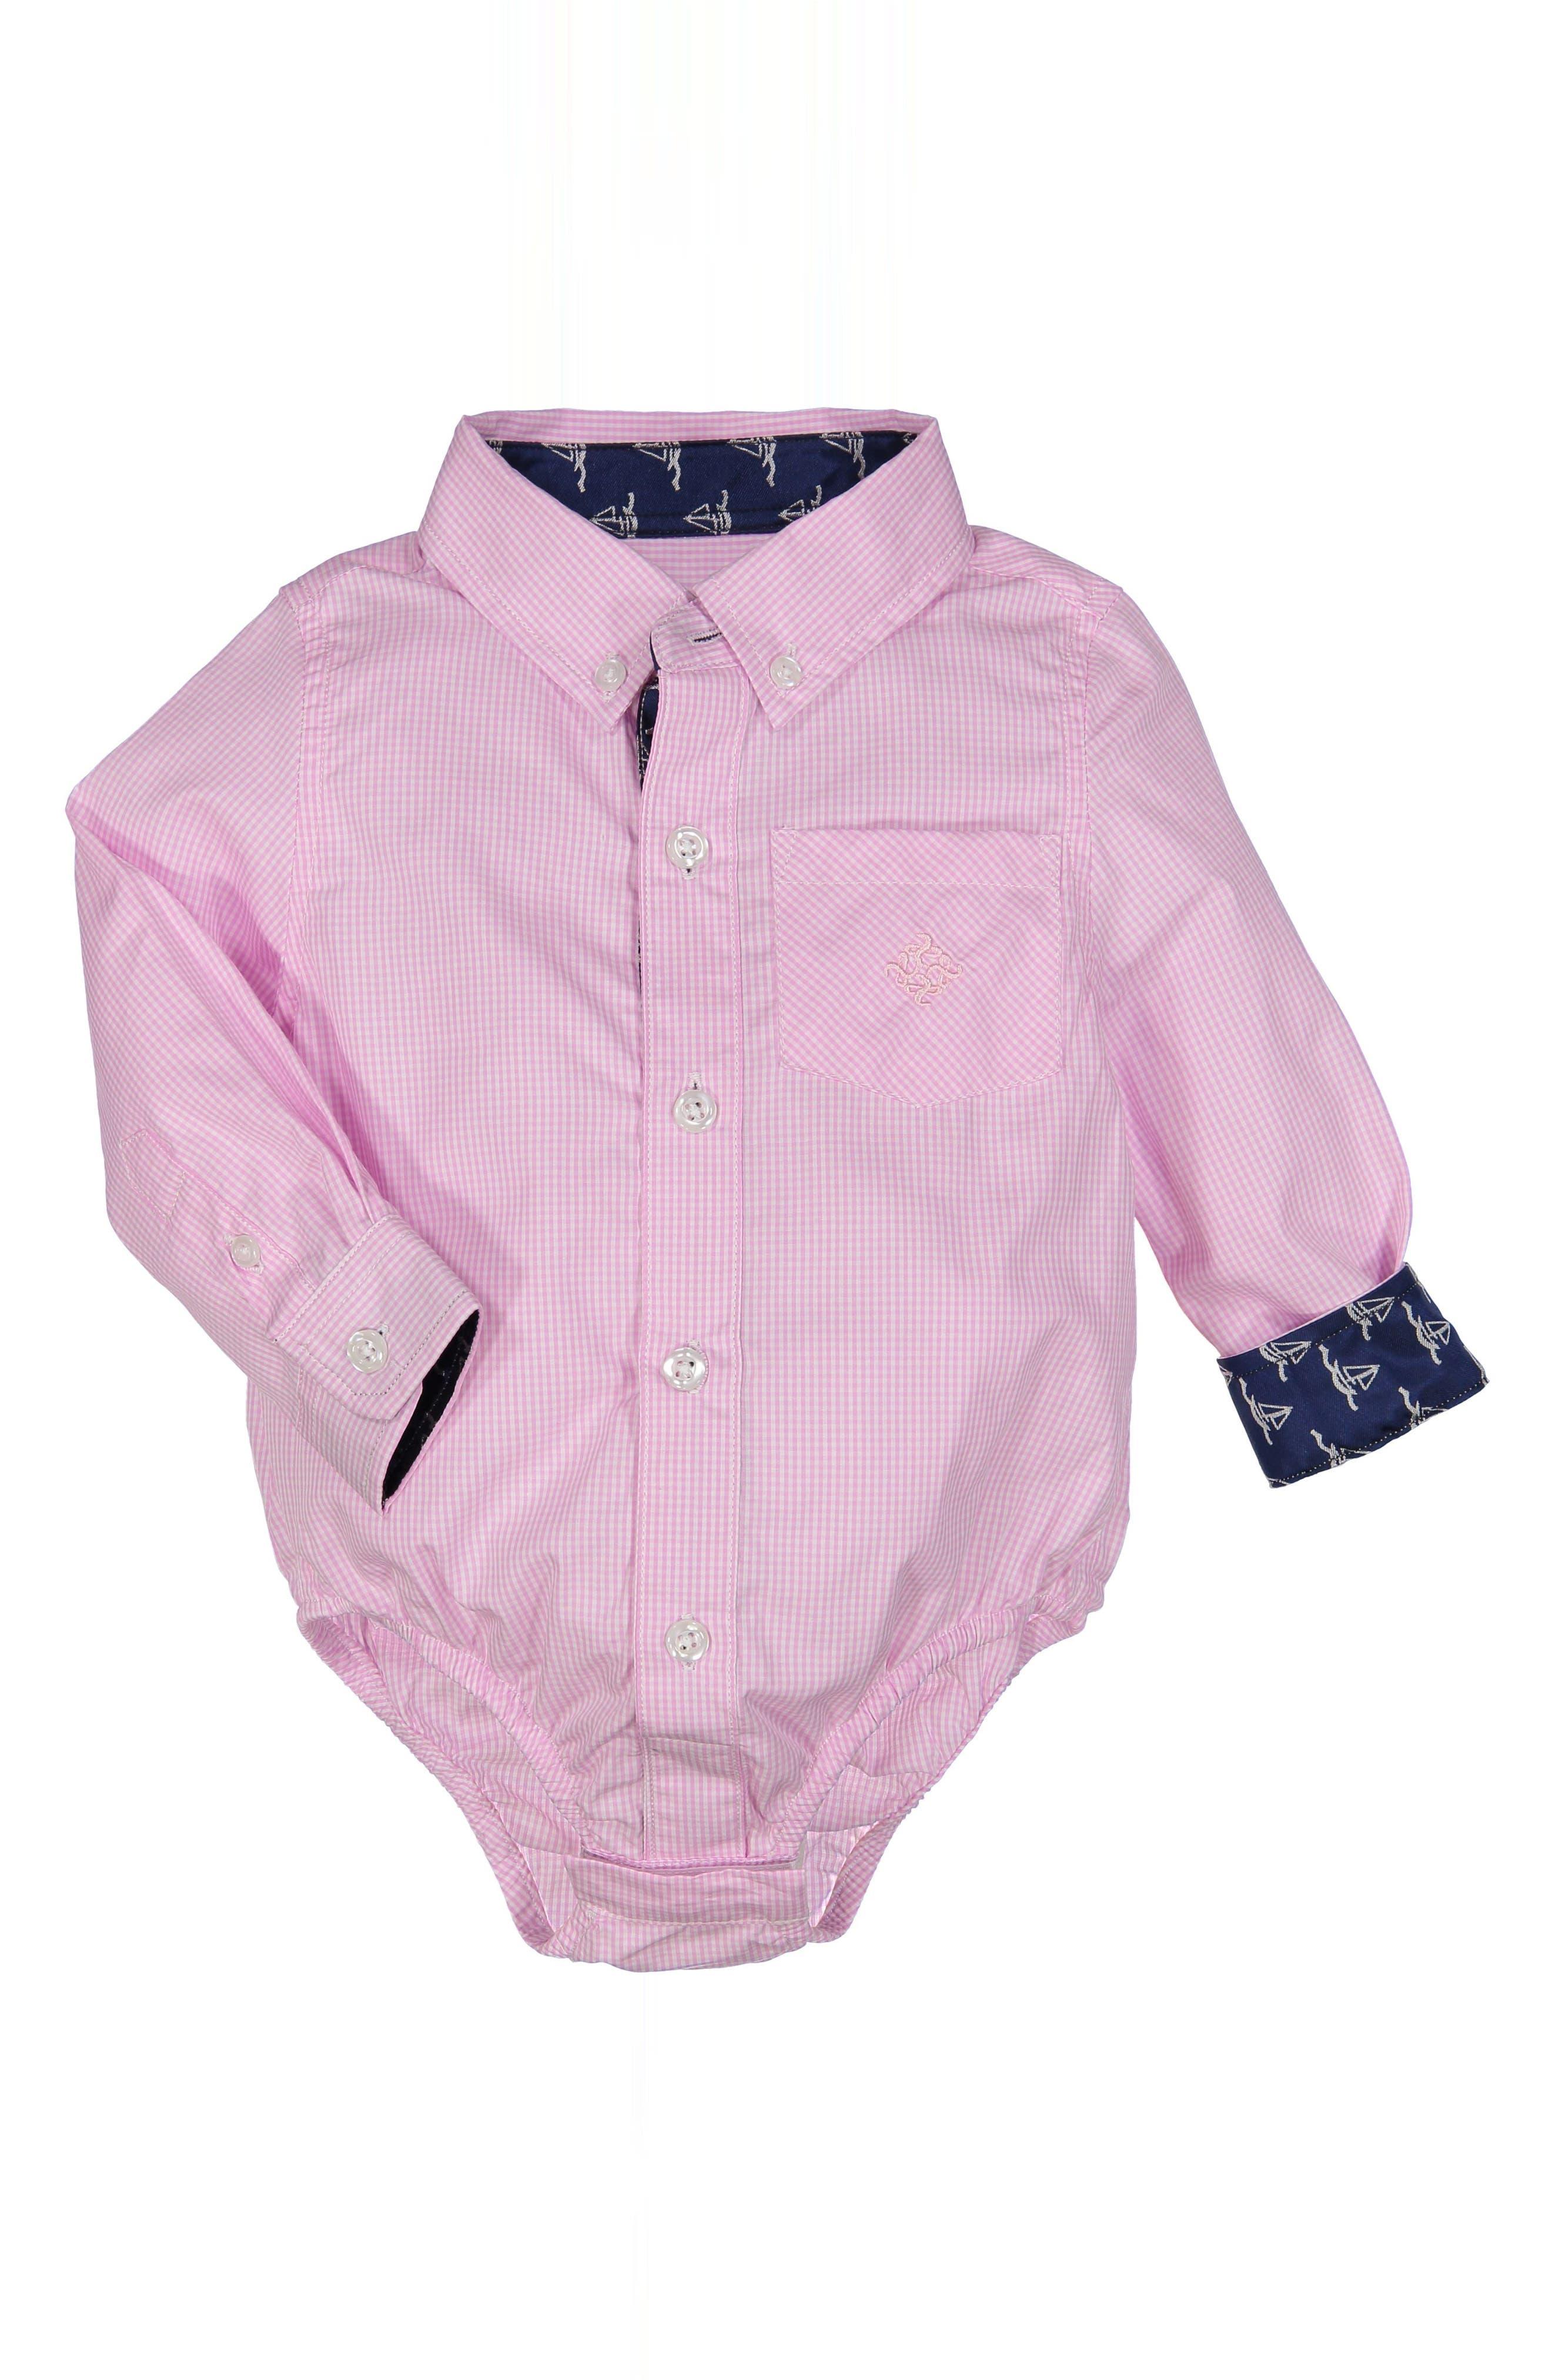 Shirtzie Microcheck Bodysuit,                         Main,                         color, Pink